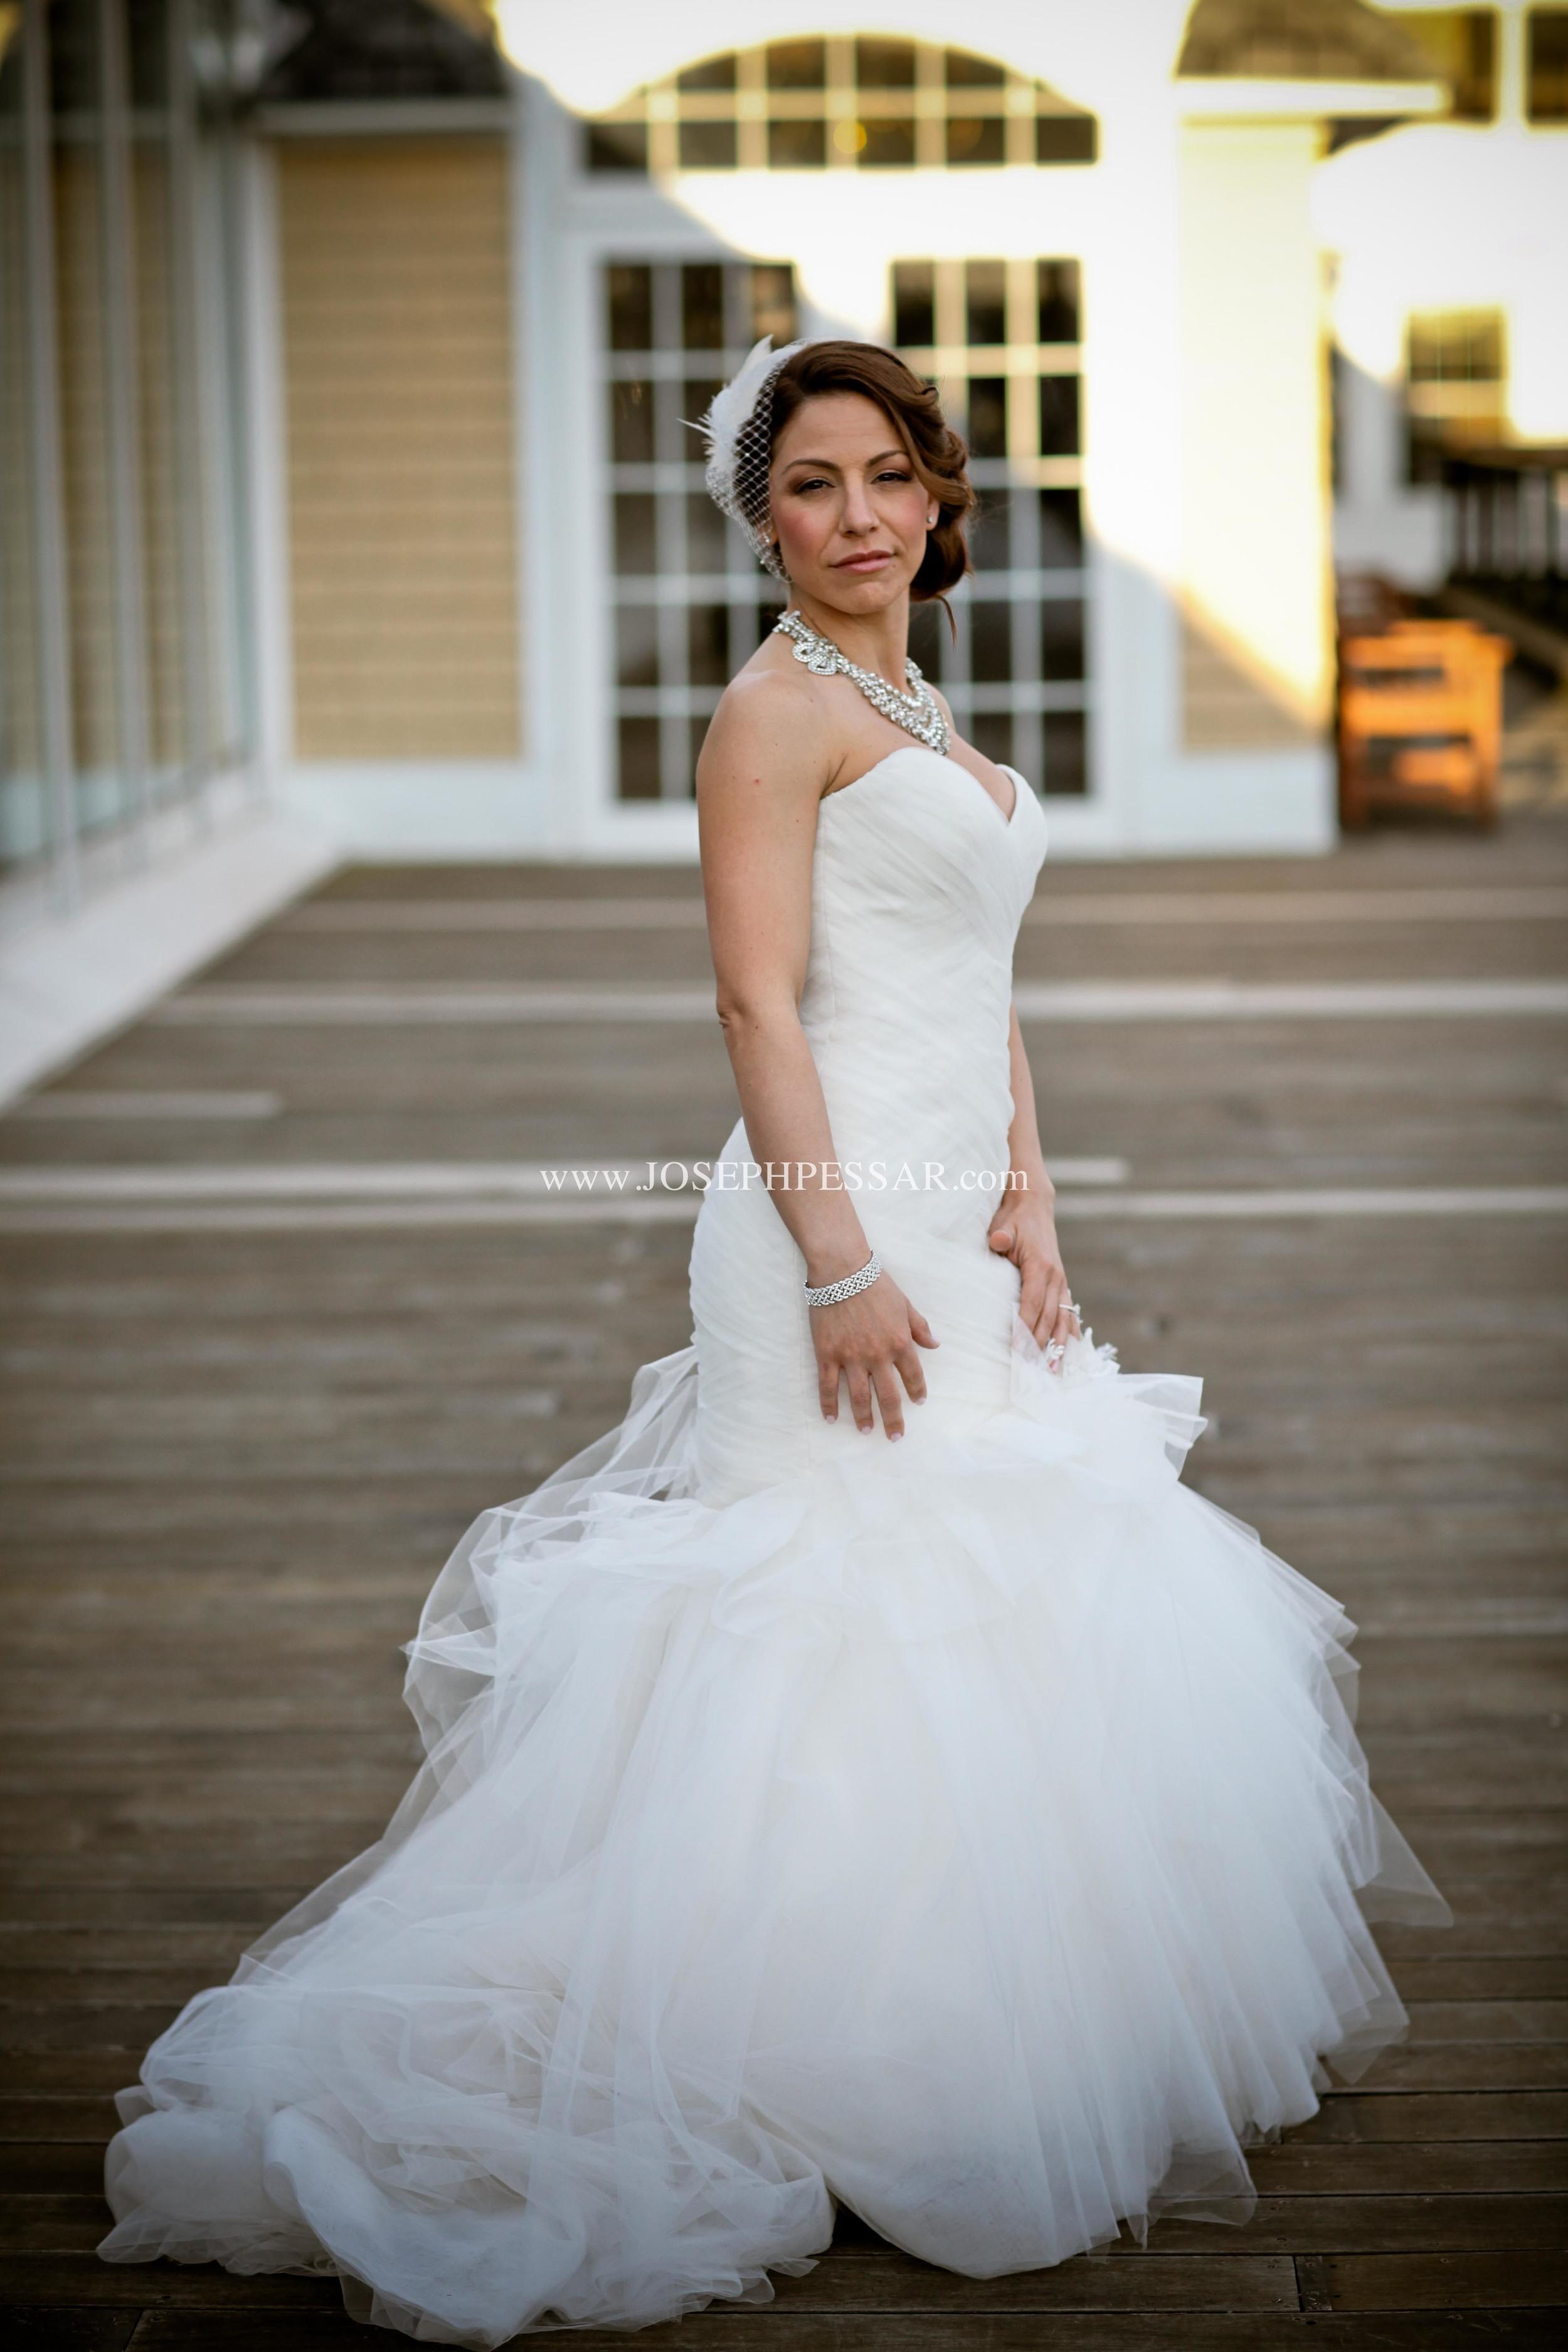 nyc_wedding_photographer0023.jpg